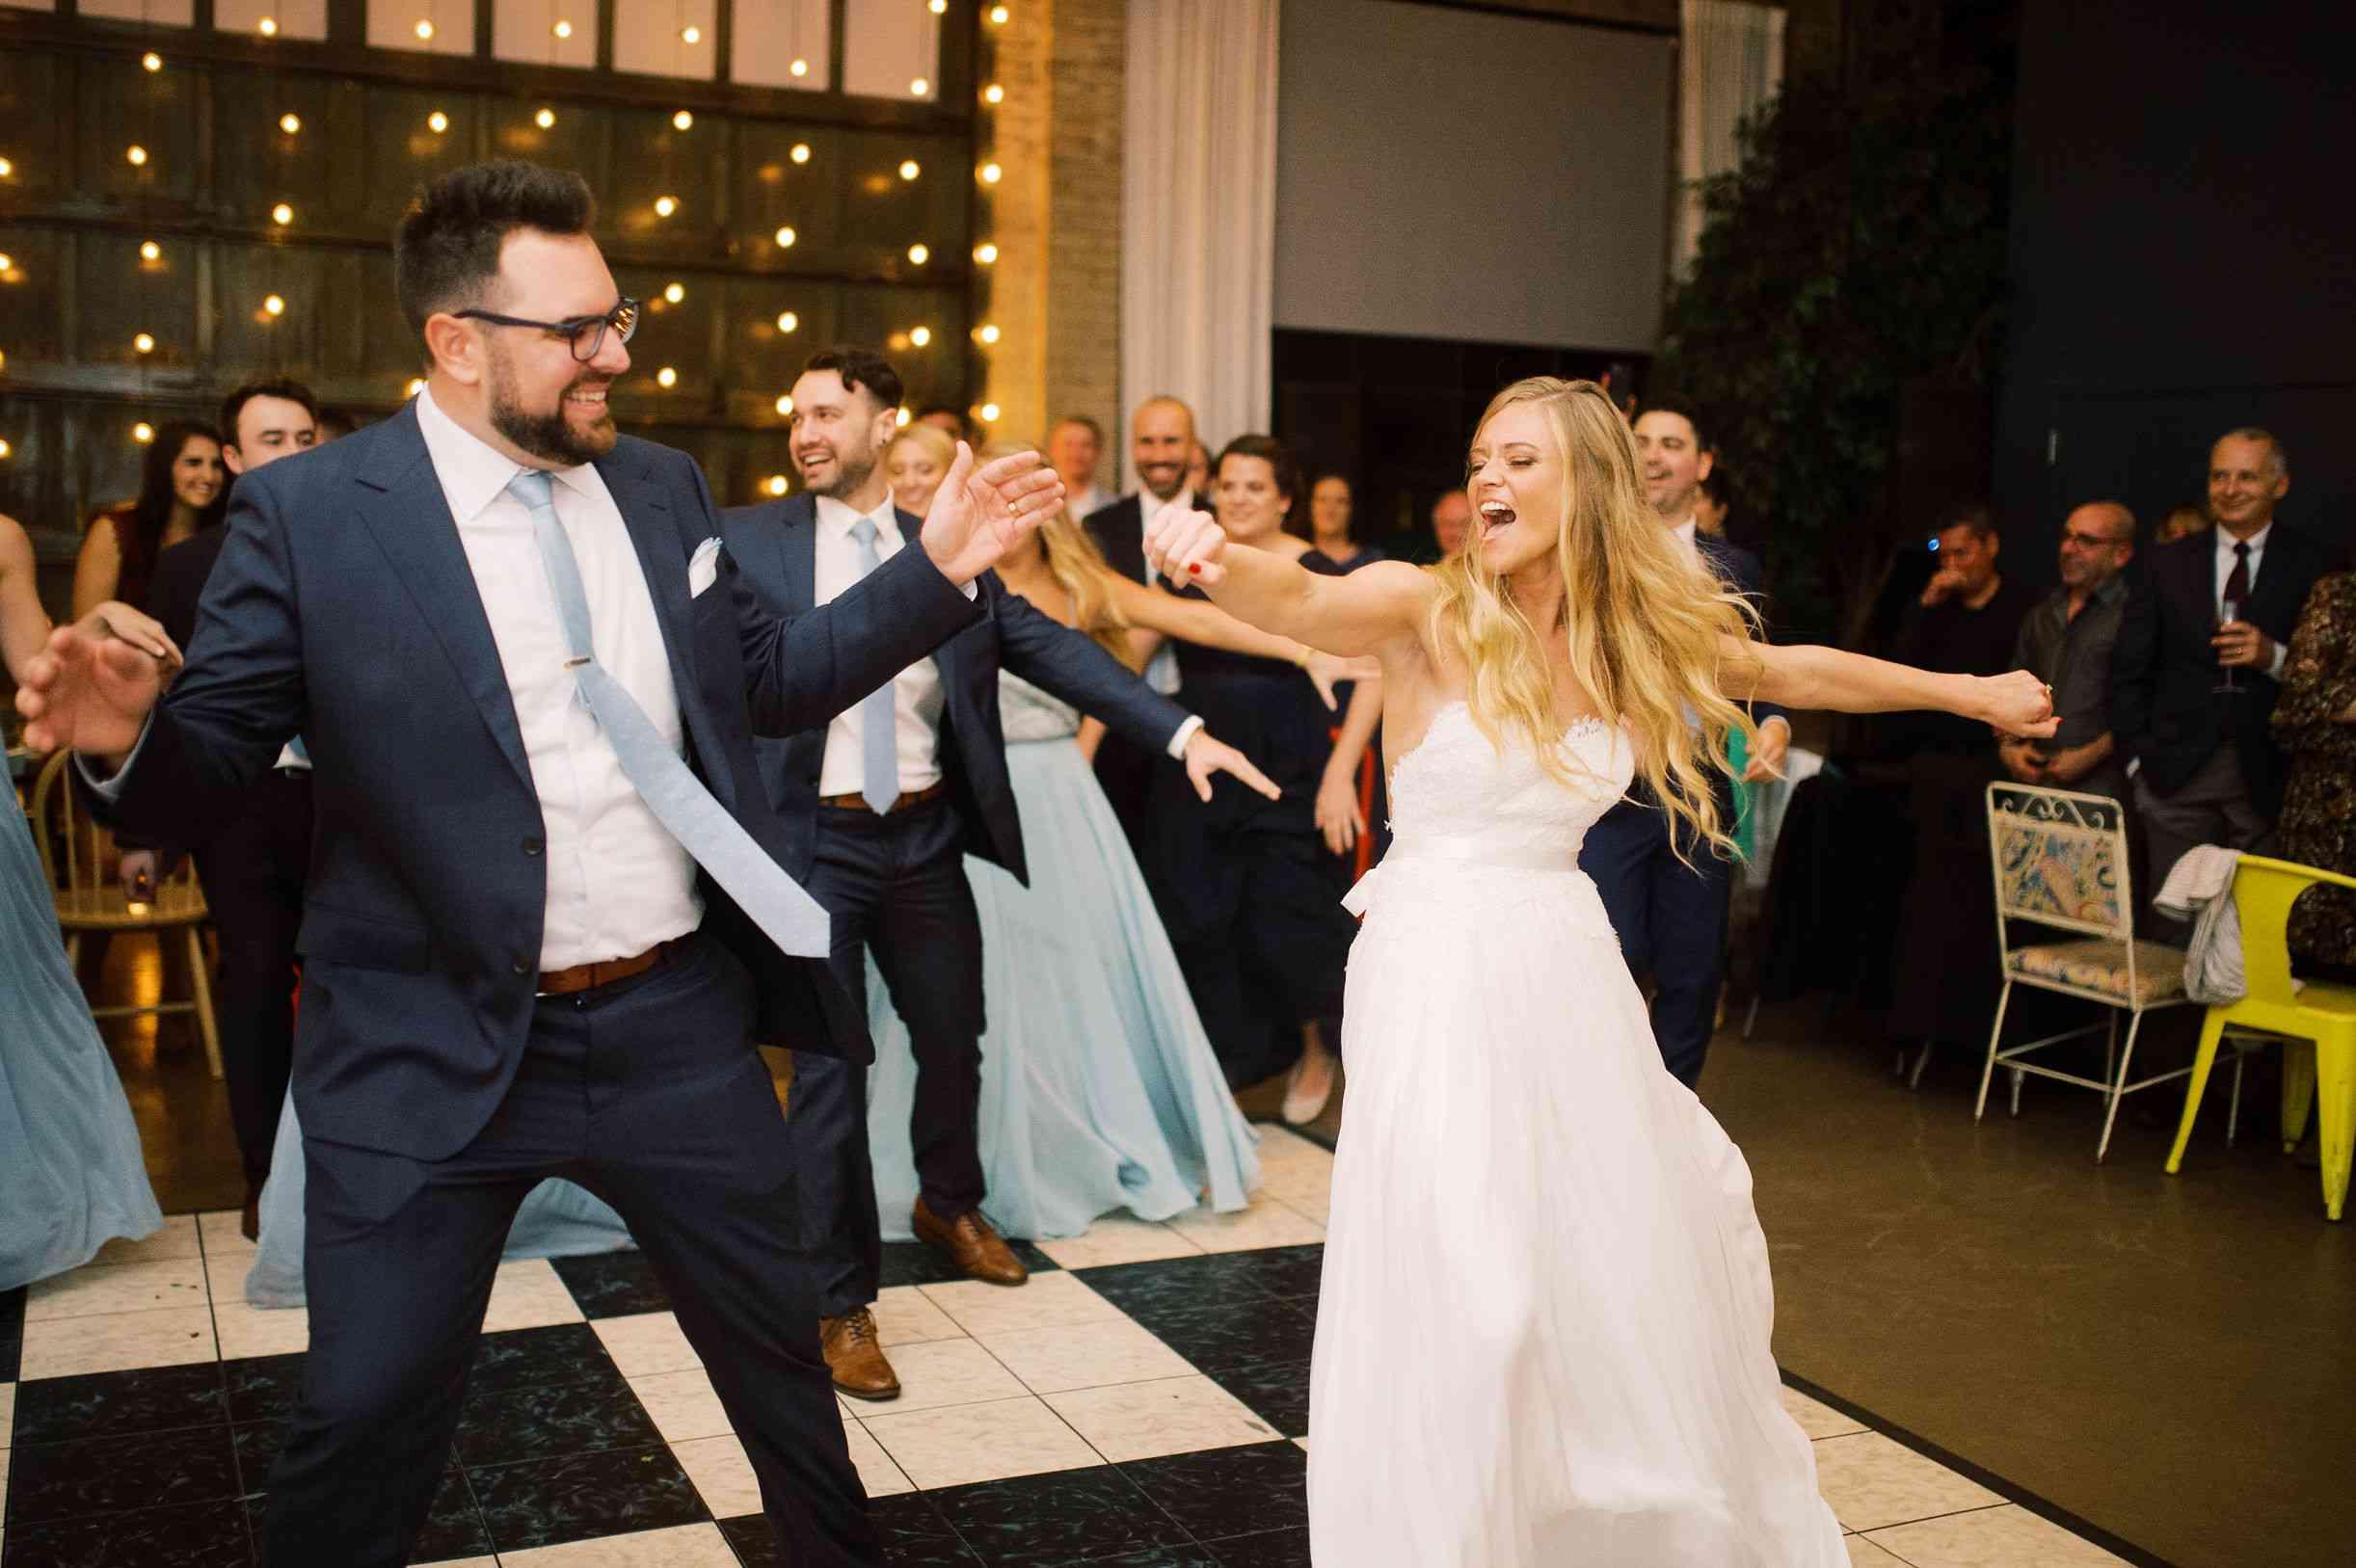 whimsical savannah wedding, bride and groom dancing flash mob